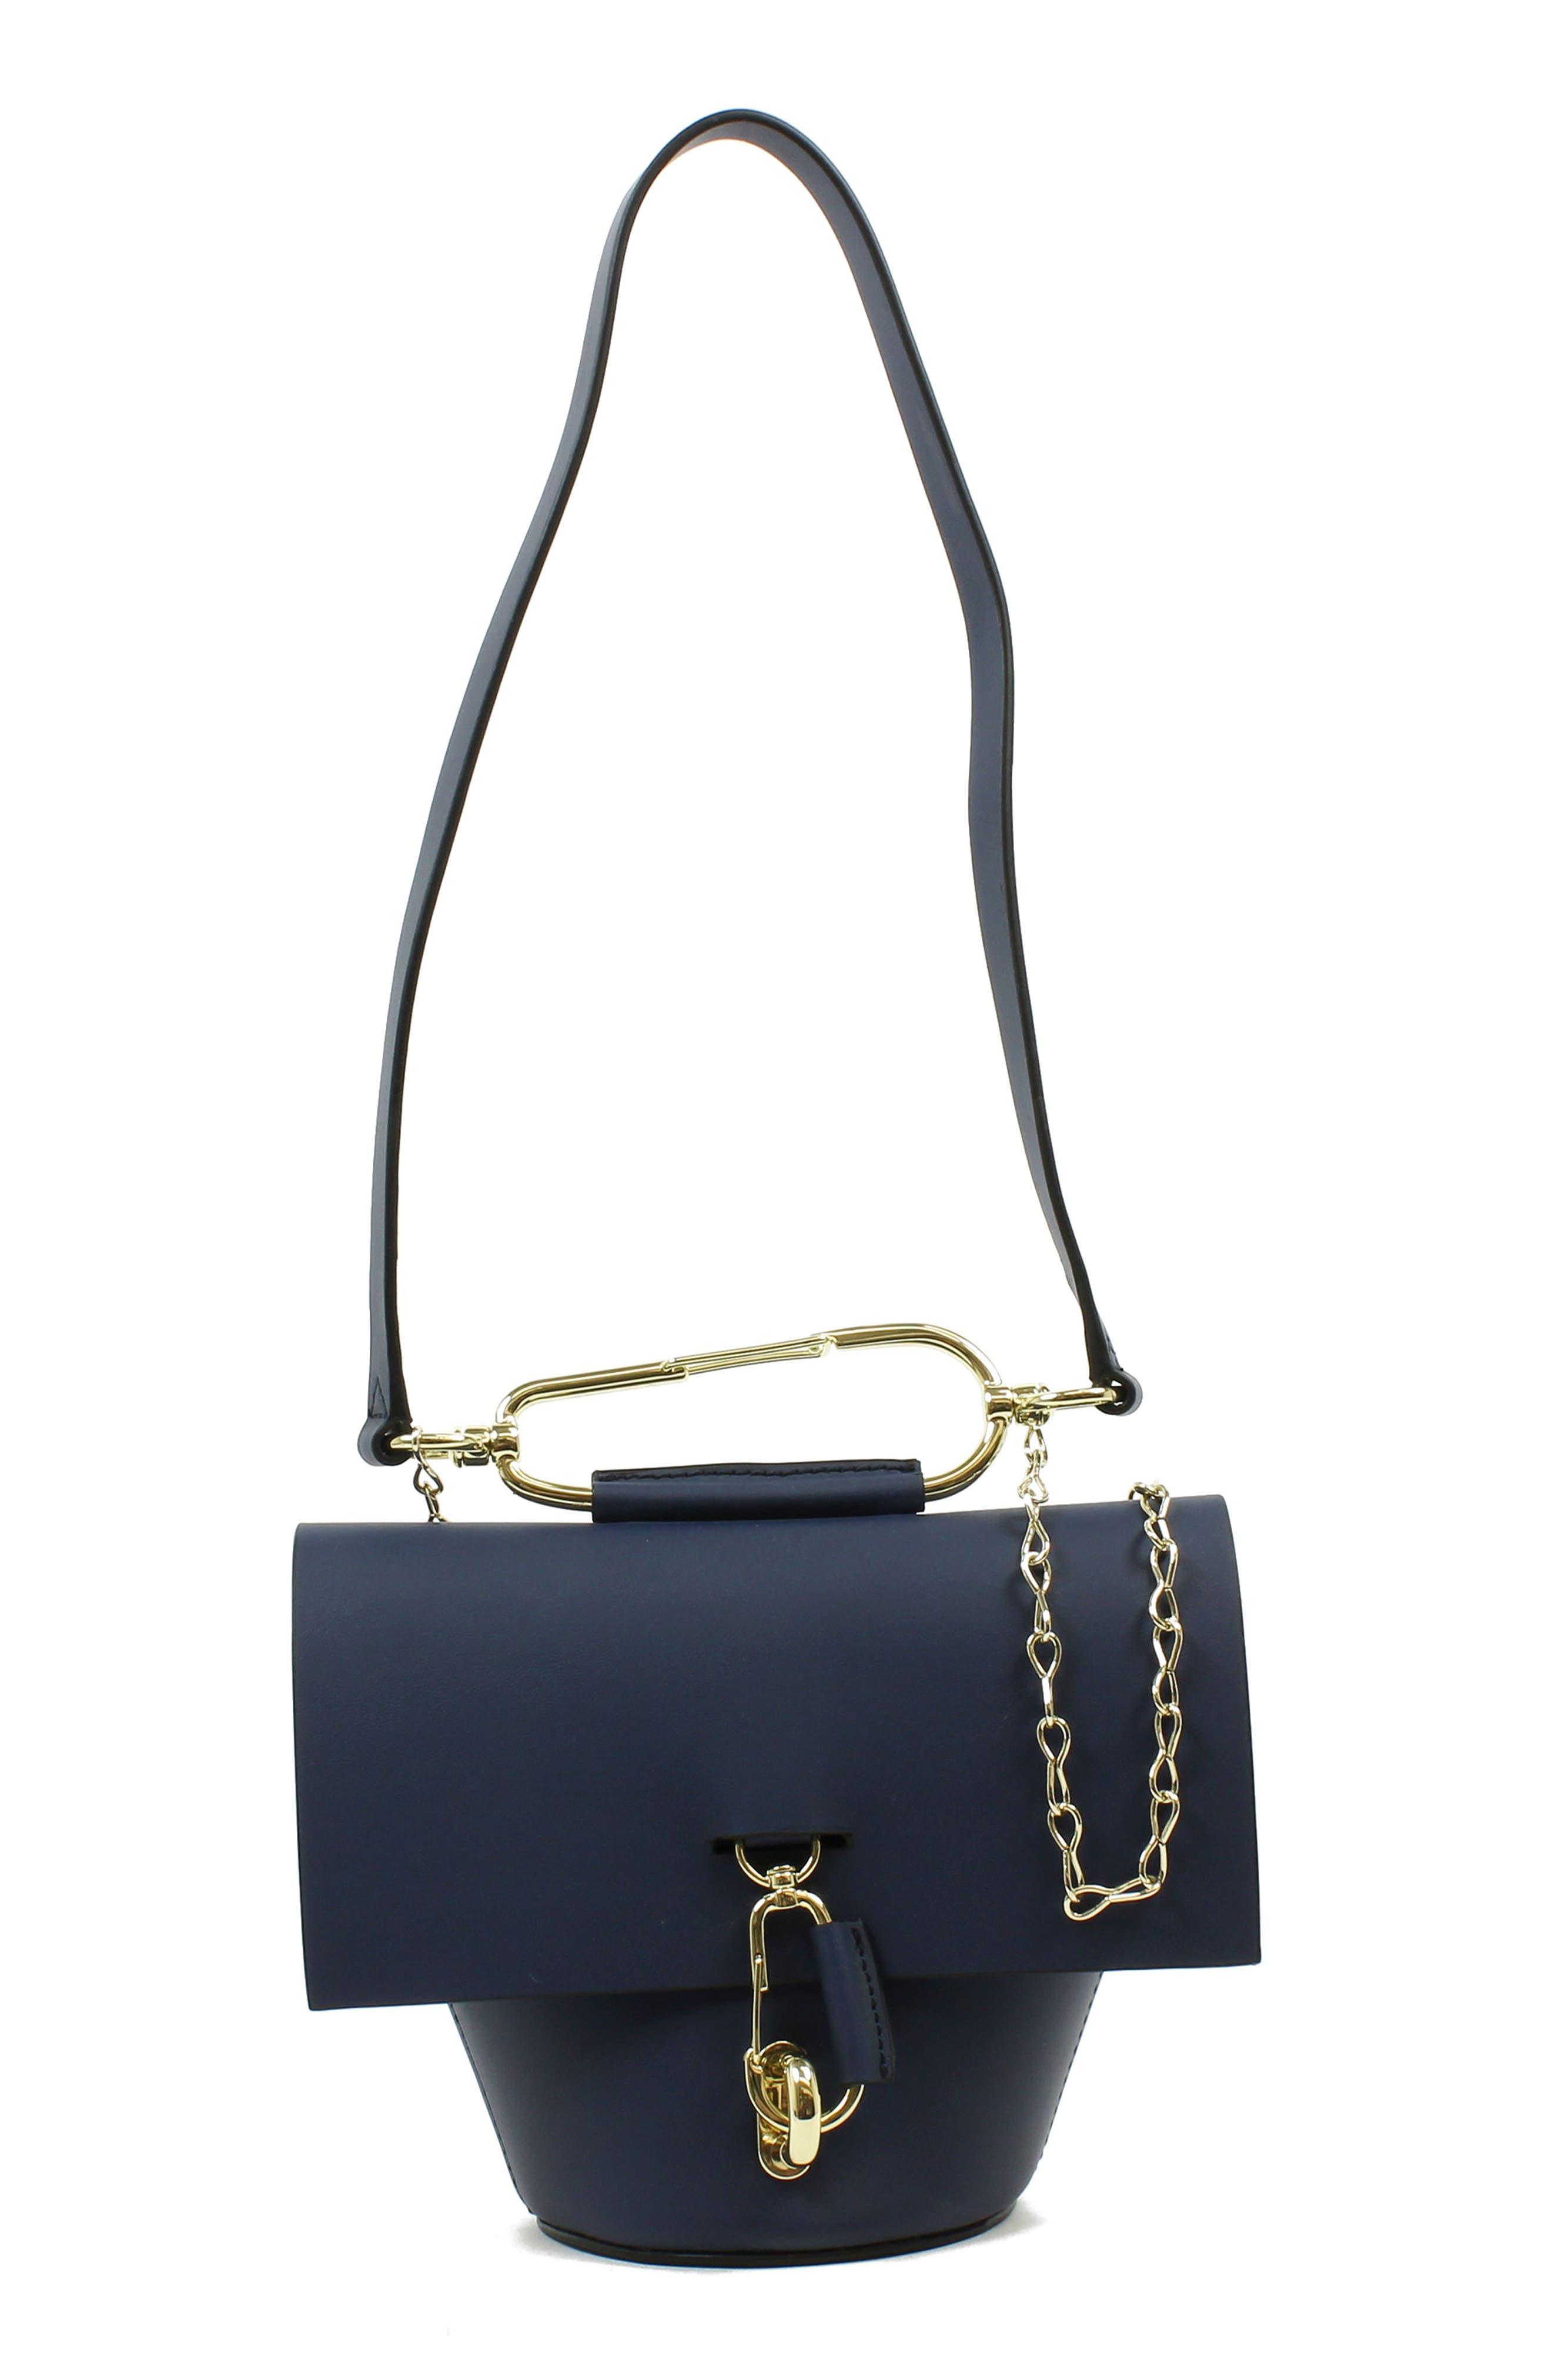 ZAC Zac Posen Belay Chain Calfskin Leather Crossbody Bag